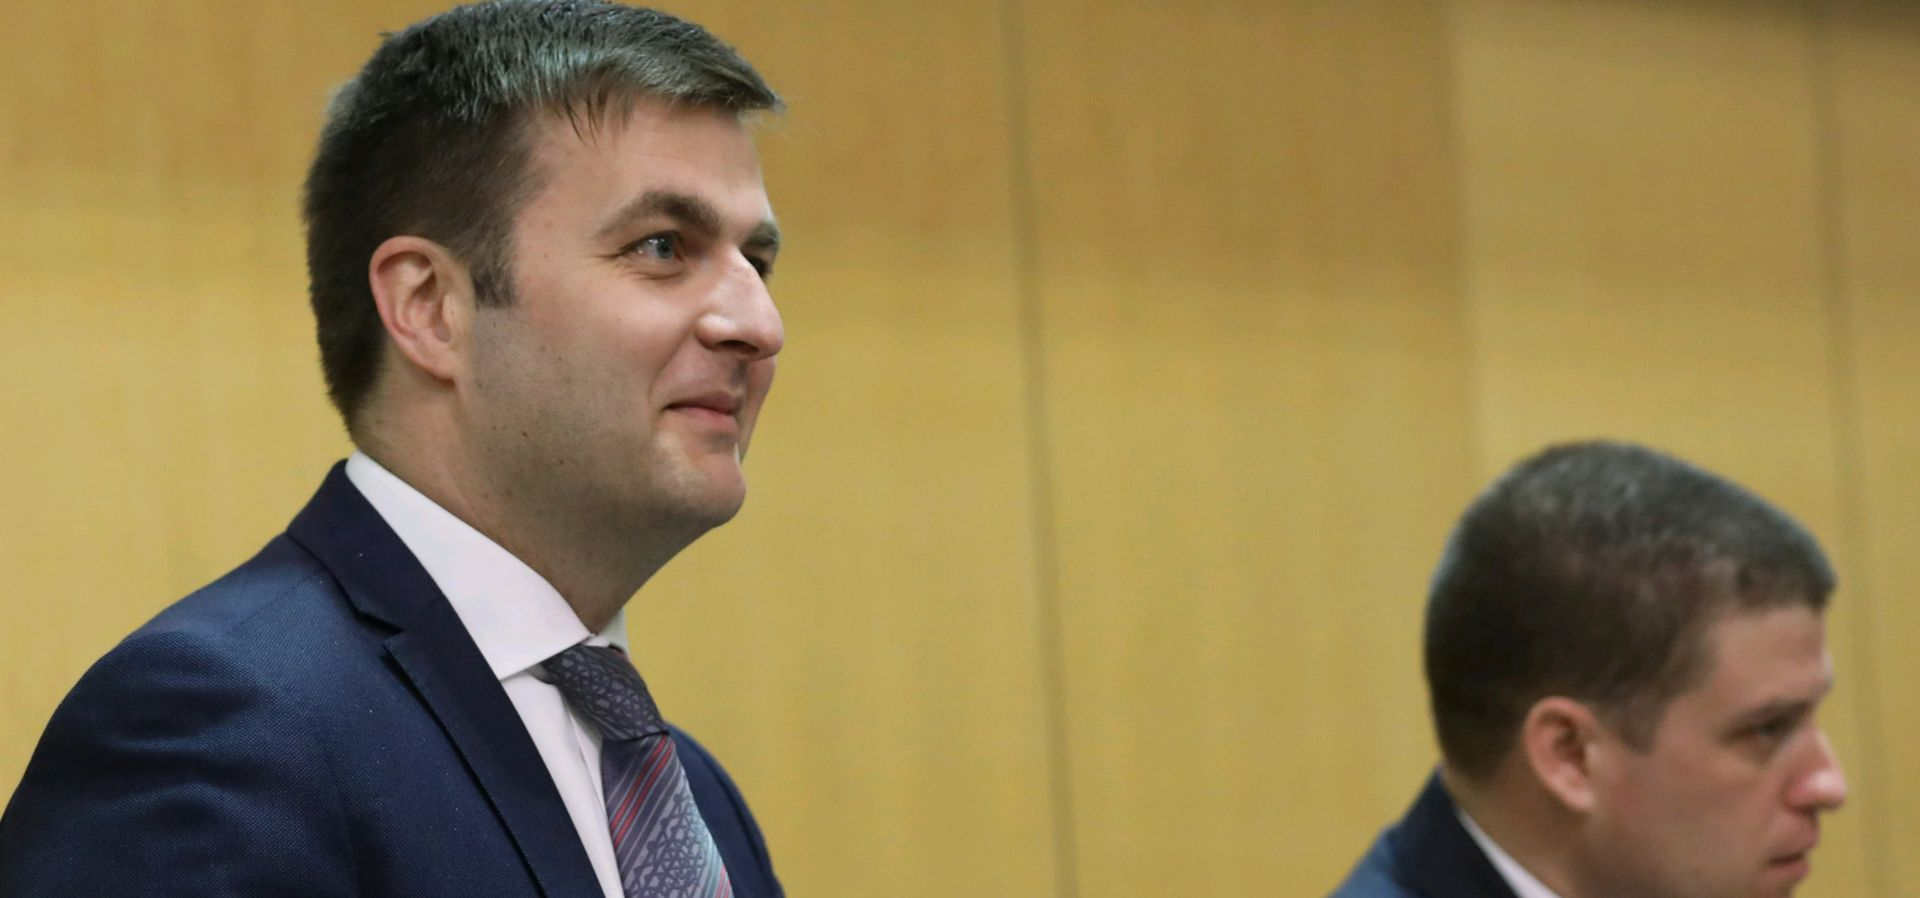 'Uzrok onečišćenja u Slavonskom Brodu još se ne zna'